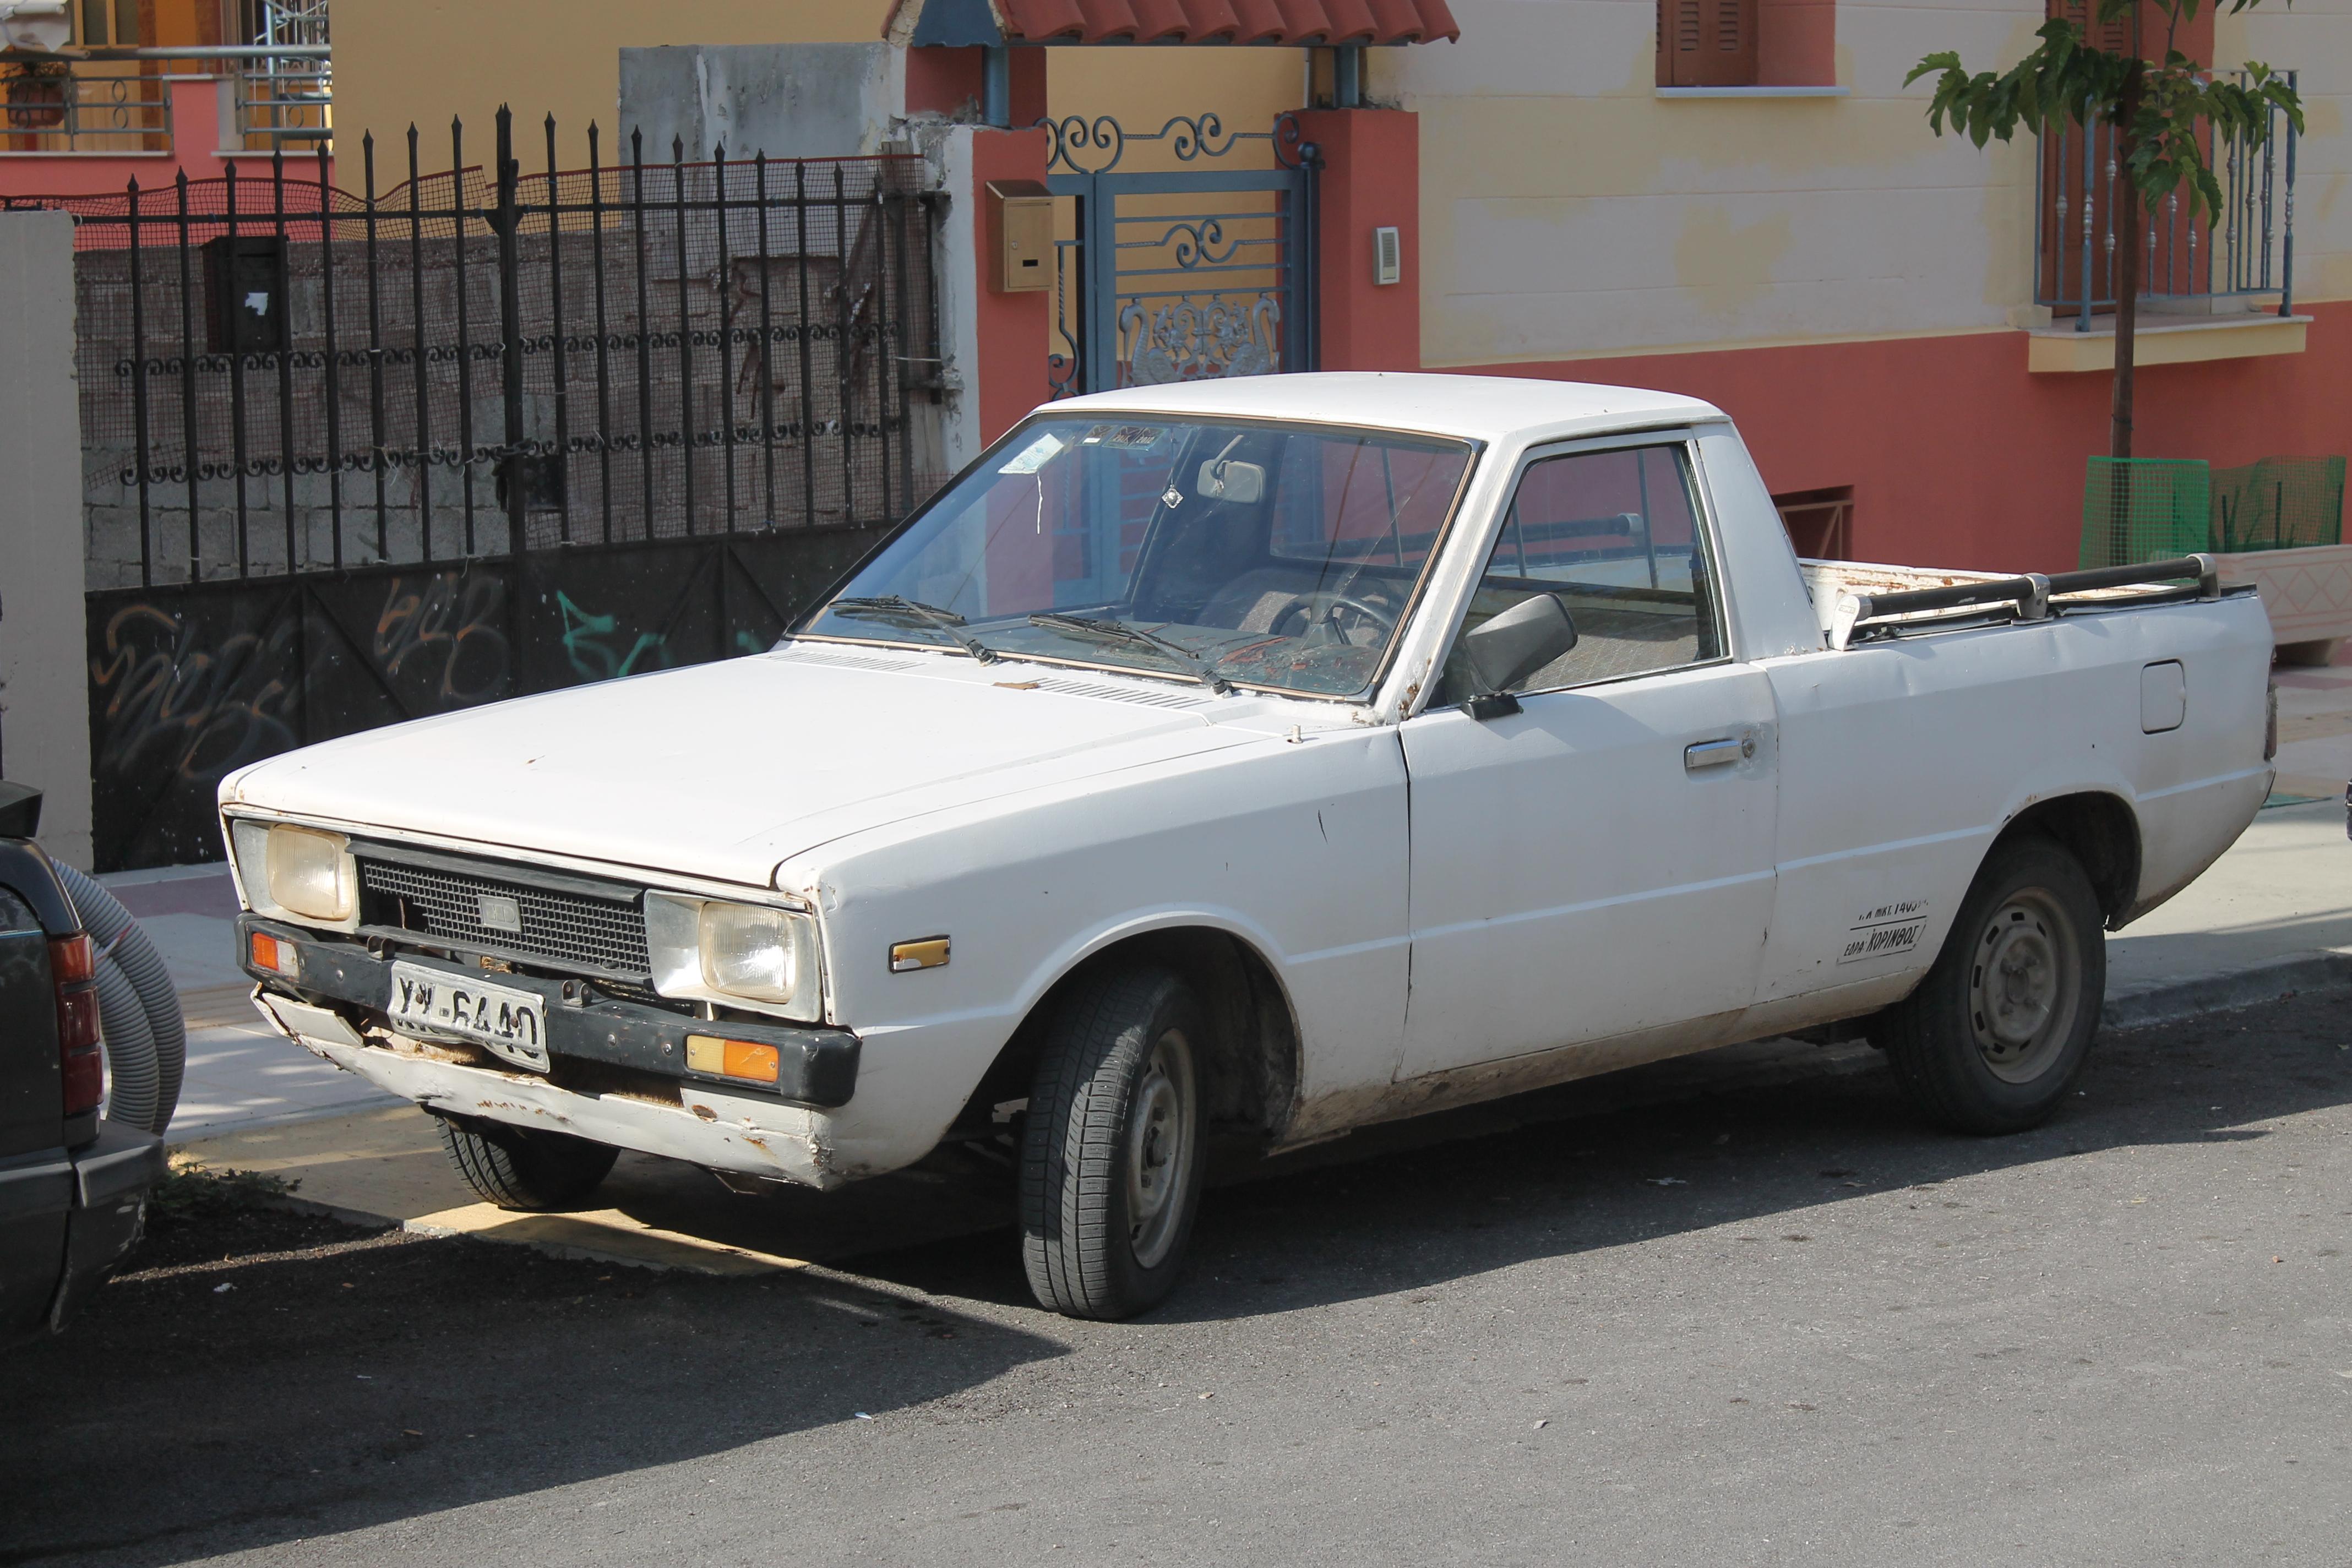 file hyundai pony pick up truck 15532708451 jpg wikimedia commons. Black Bedroom Furniture Sets. Home Design Ideas